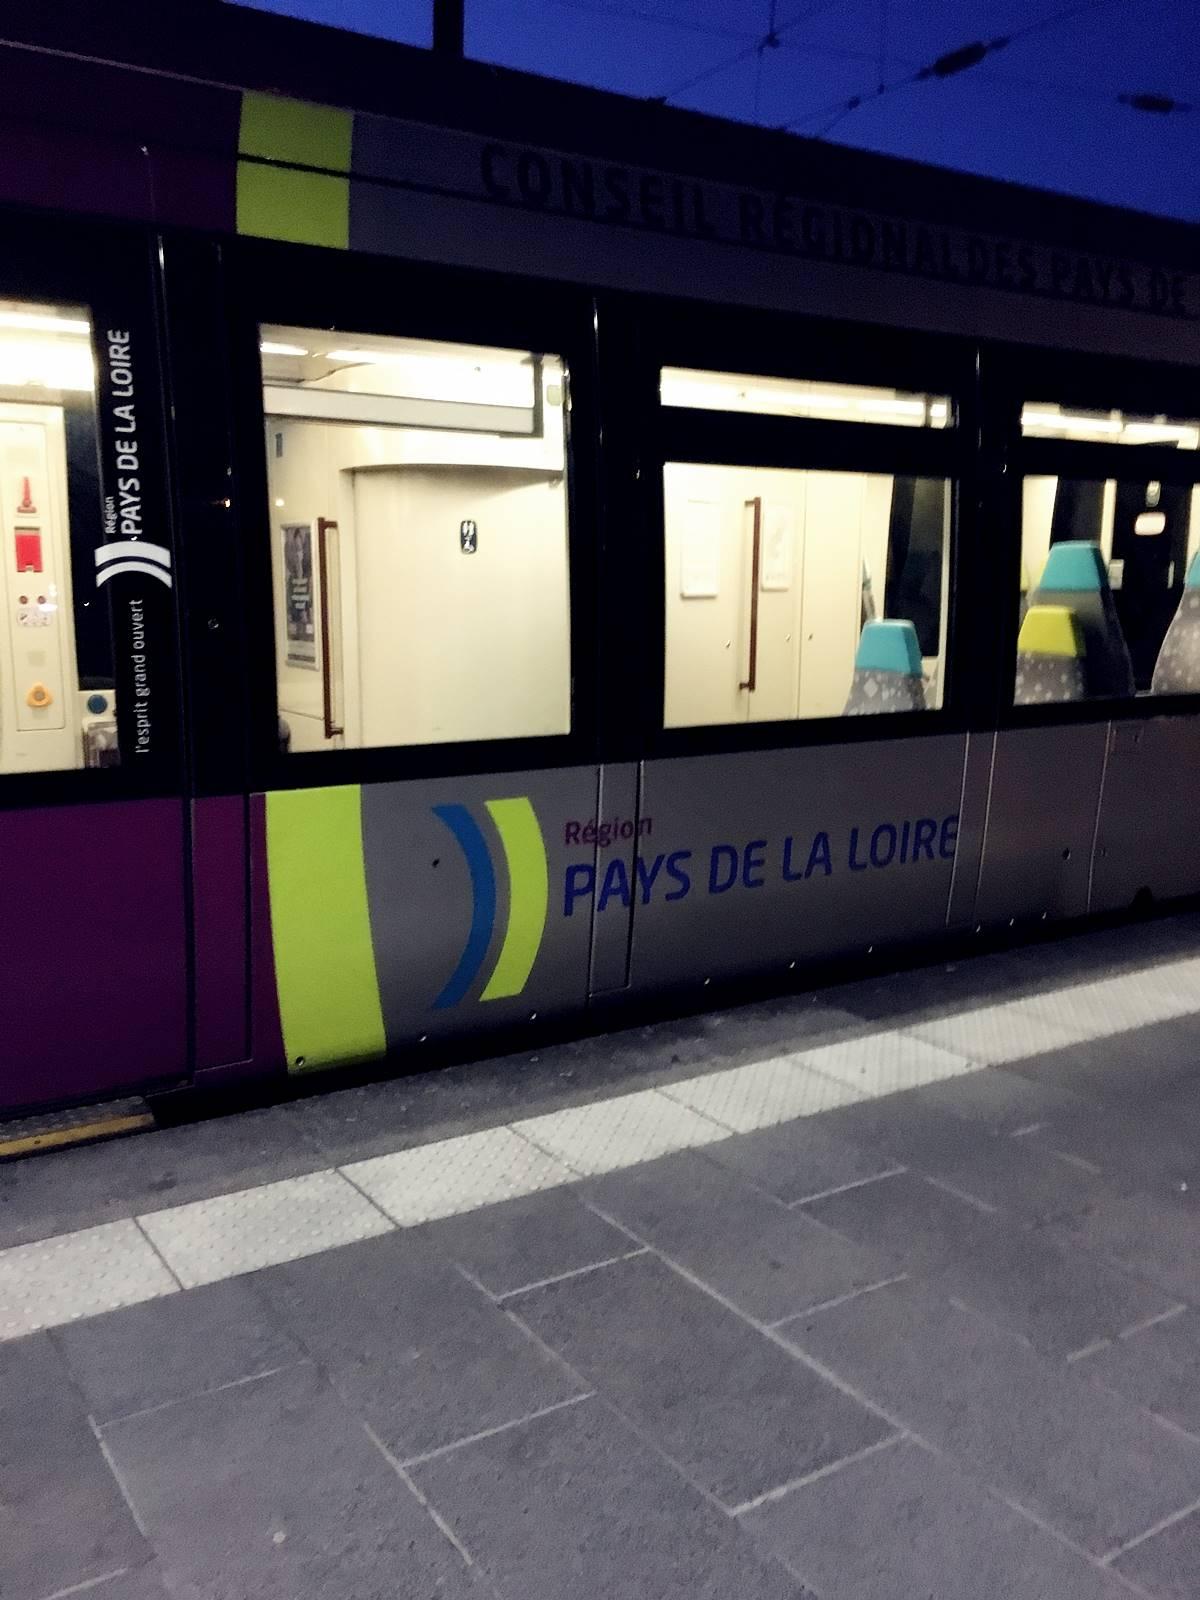 Teste tram train chateaubriant nantes 2